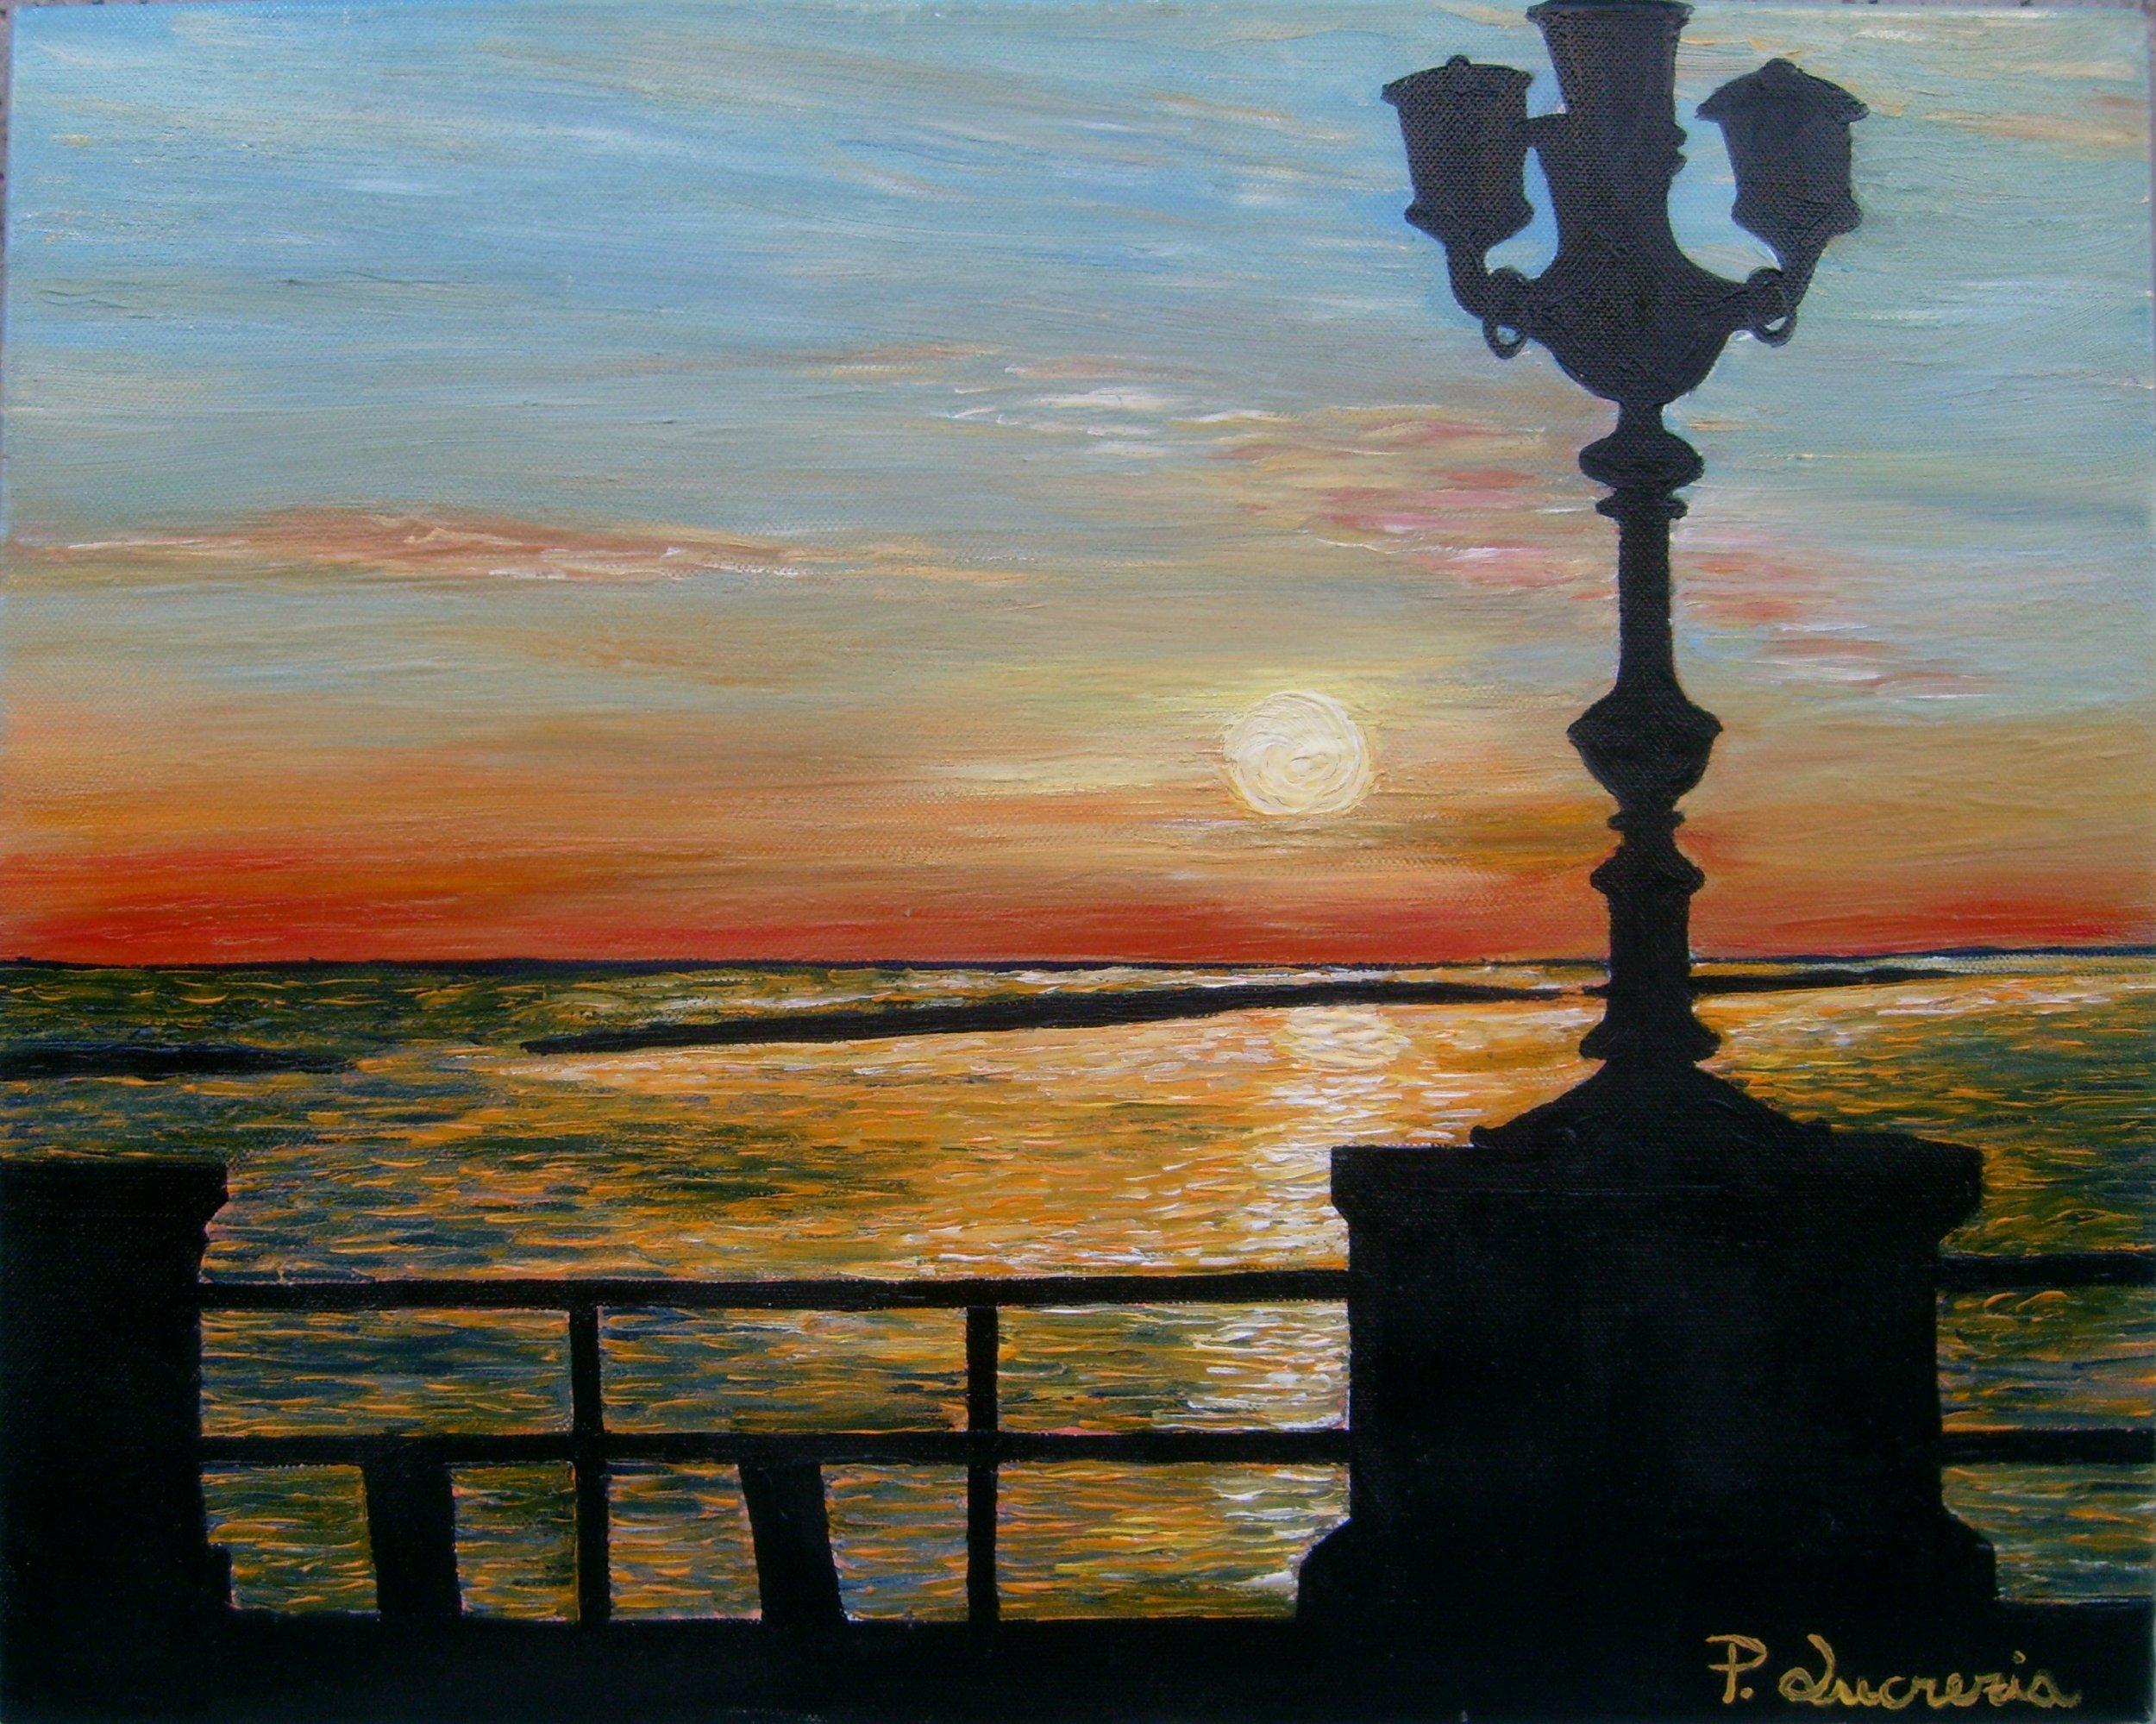 bari lungomare tramonto az - photo#34